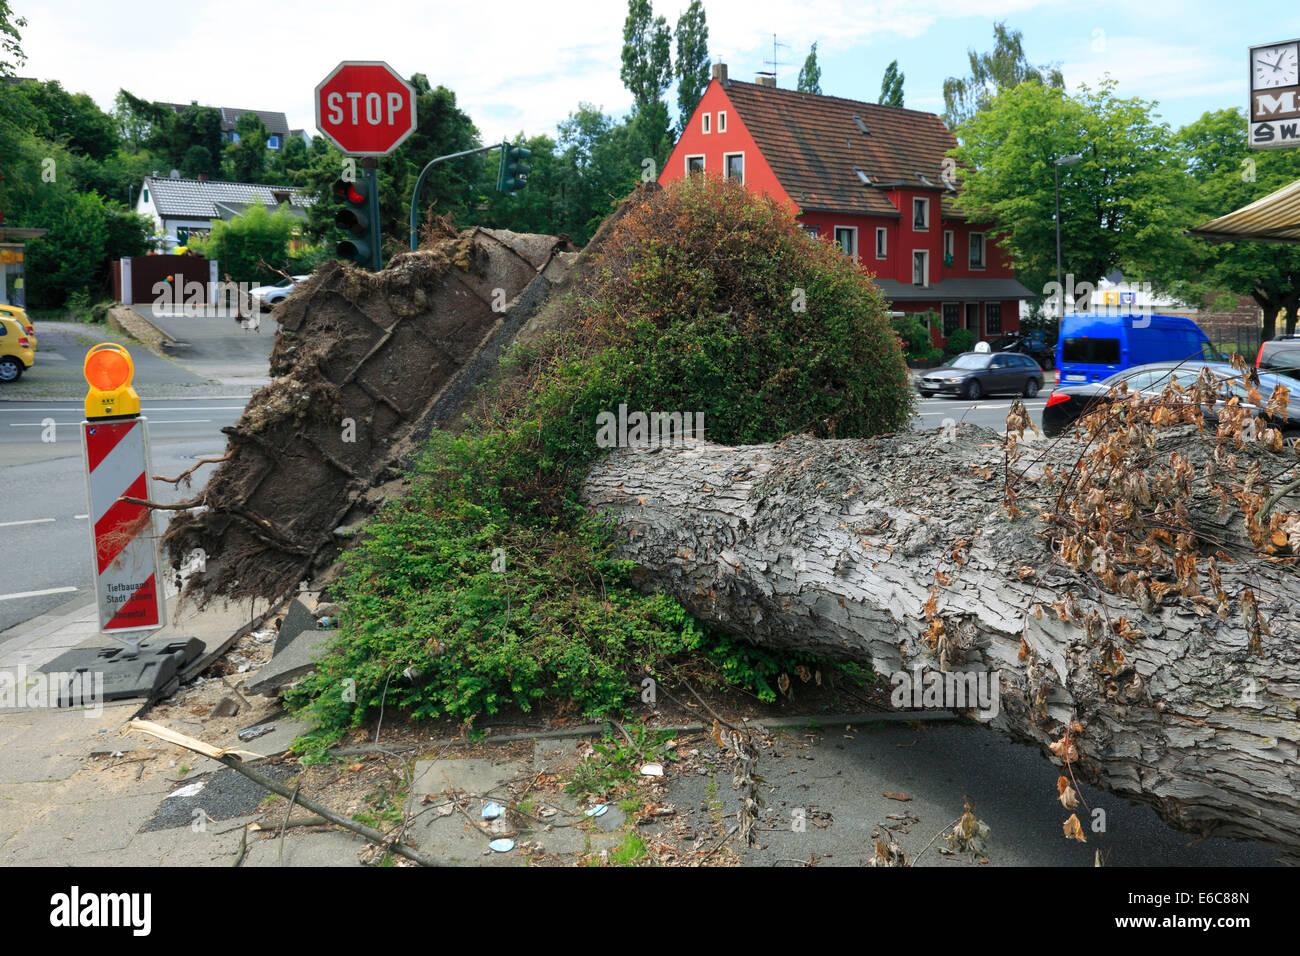 storm damages by depression 'Ela' on June 9, 2014 an June 10, 2014, disrooted tree at corner Velberter Strasse, - Stock Image